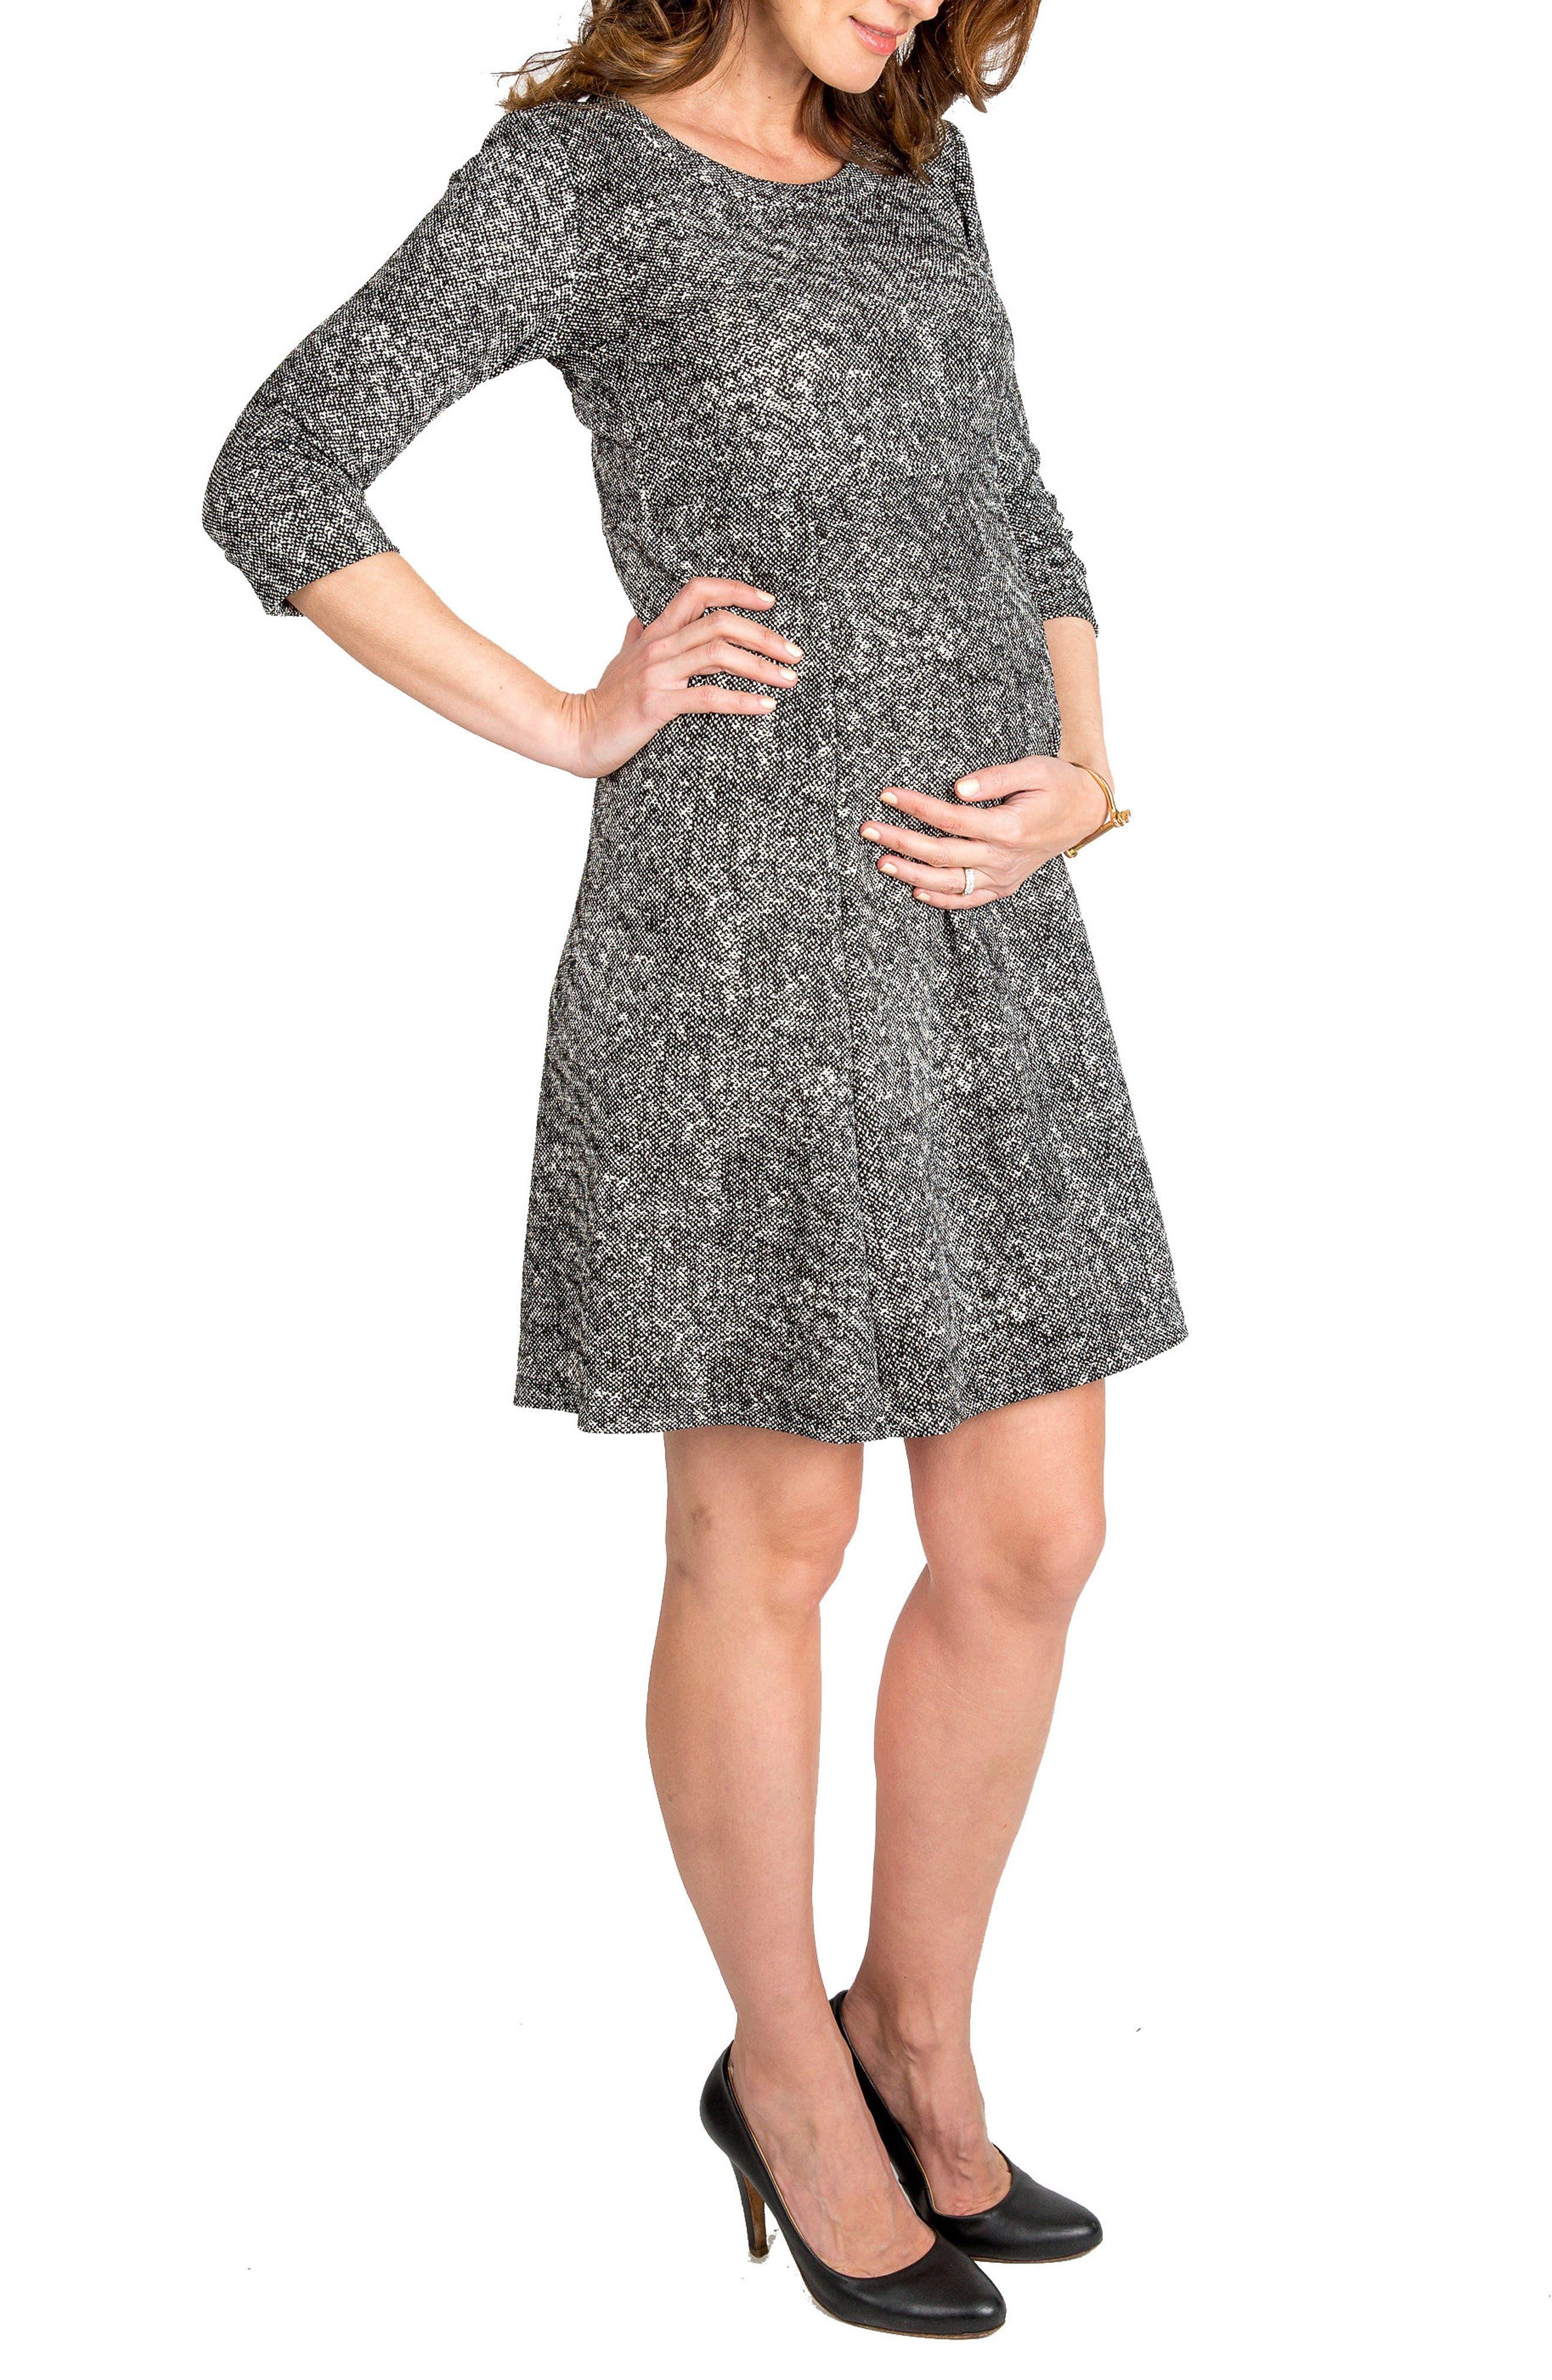 NOM Jack Maternity Dress,                             Main thumbnail 1, color,                             Tweed